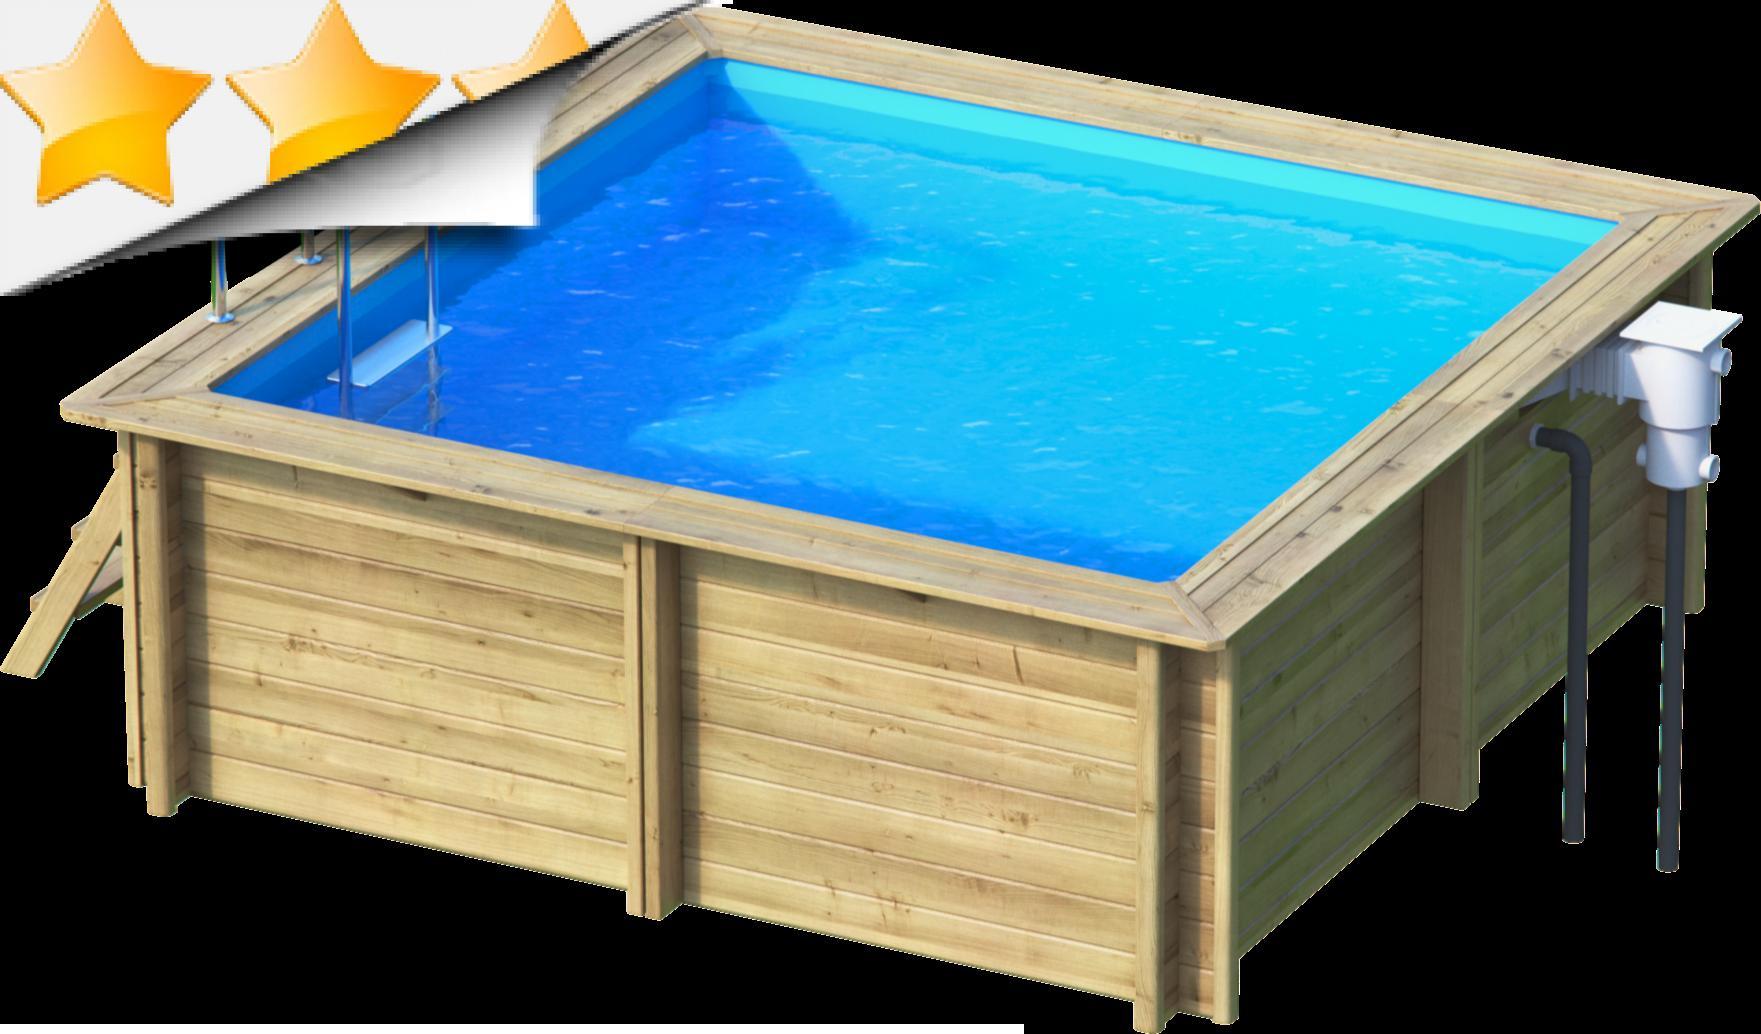 piscine bois carree 3x3